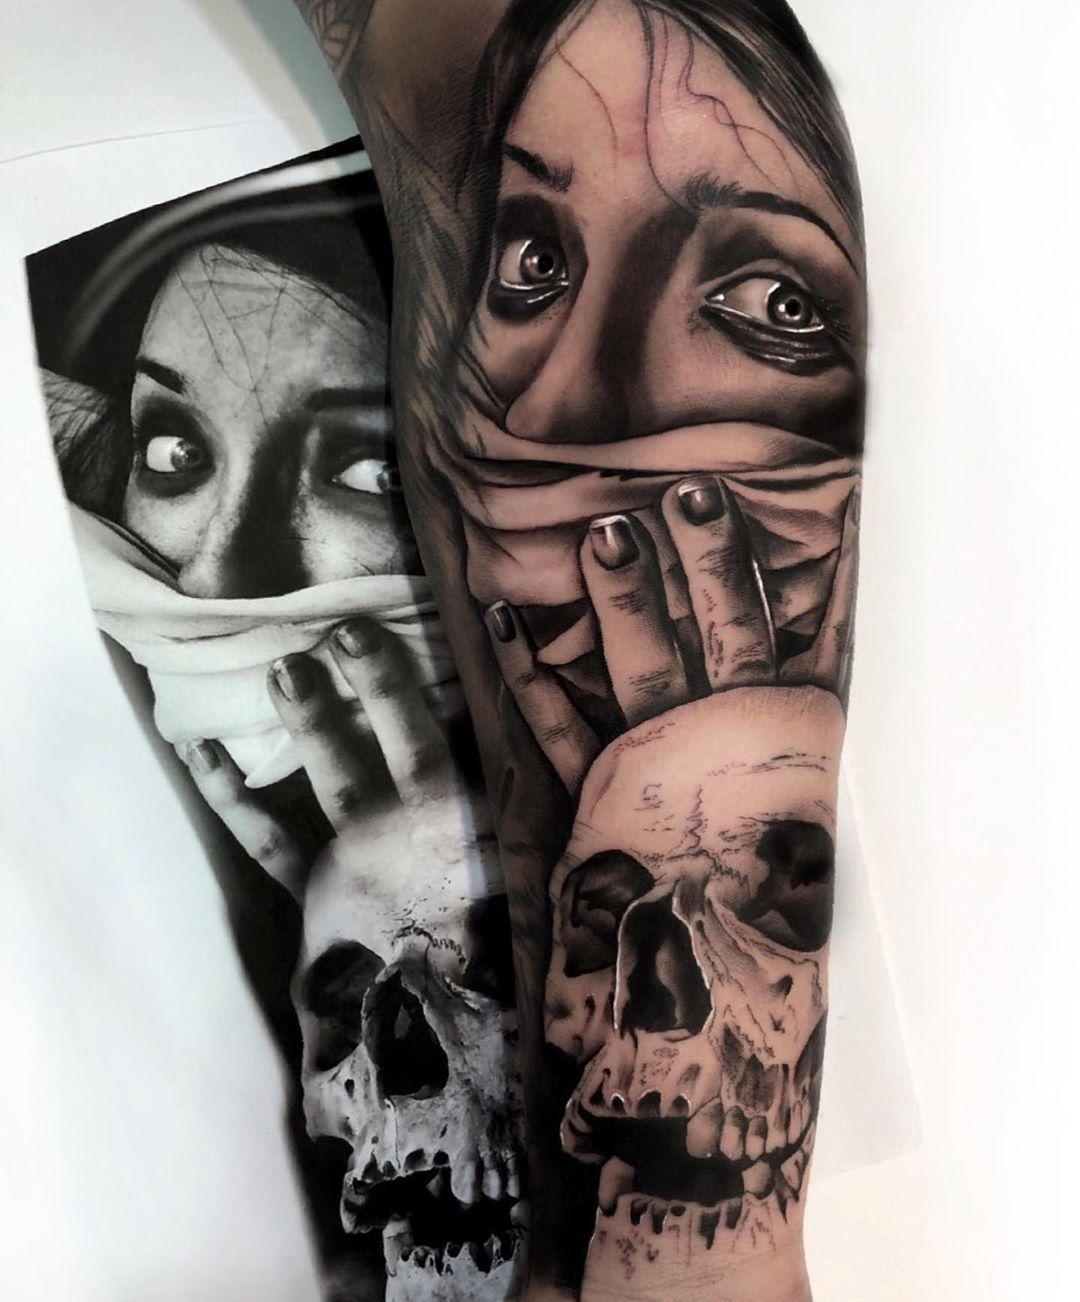 followforfollow,berlin,followmeciudadreal,ciudadreal,tomelloso,almagro,puertollano,tatuajesenpuertollano,ciudadrealsetatua,ink,tatuajes,realismo,realistictattoo,ciudadrealtattoo,tatuajesenpuertollano,traditionaltattoos,castillalamancha,ink,tattooart,zurichtattoo,daimiel,inkedgirls,inkig,ink,inktattoos